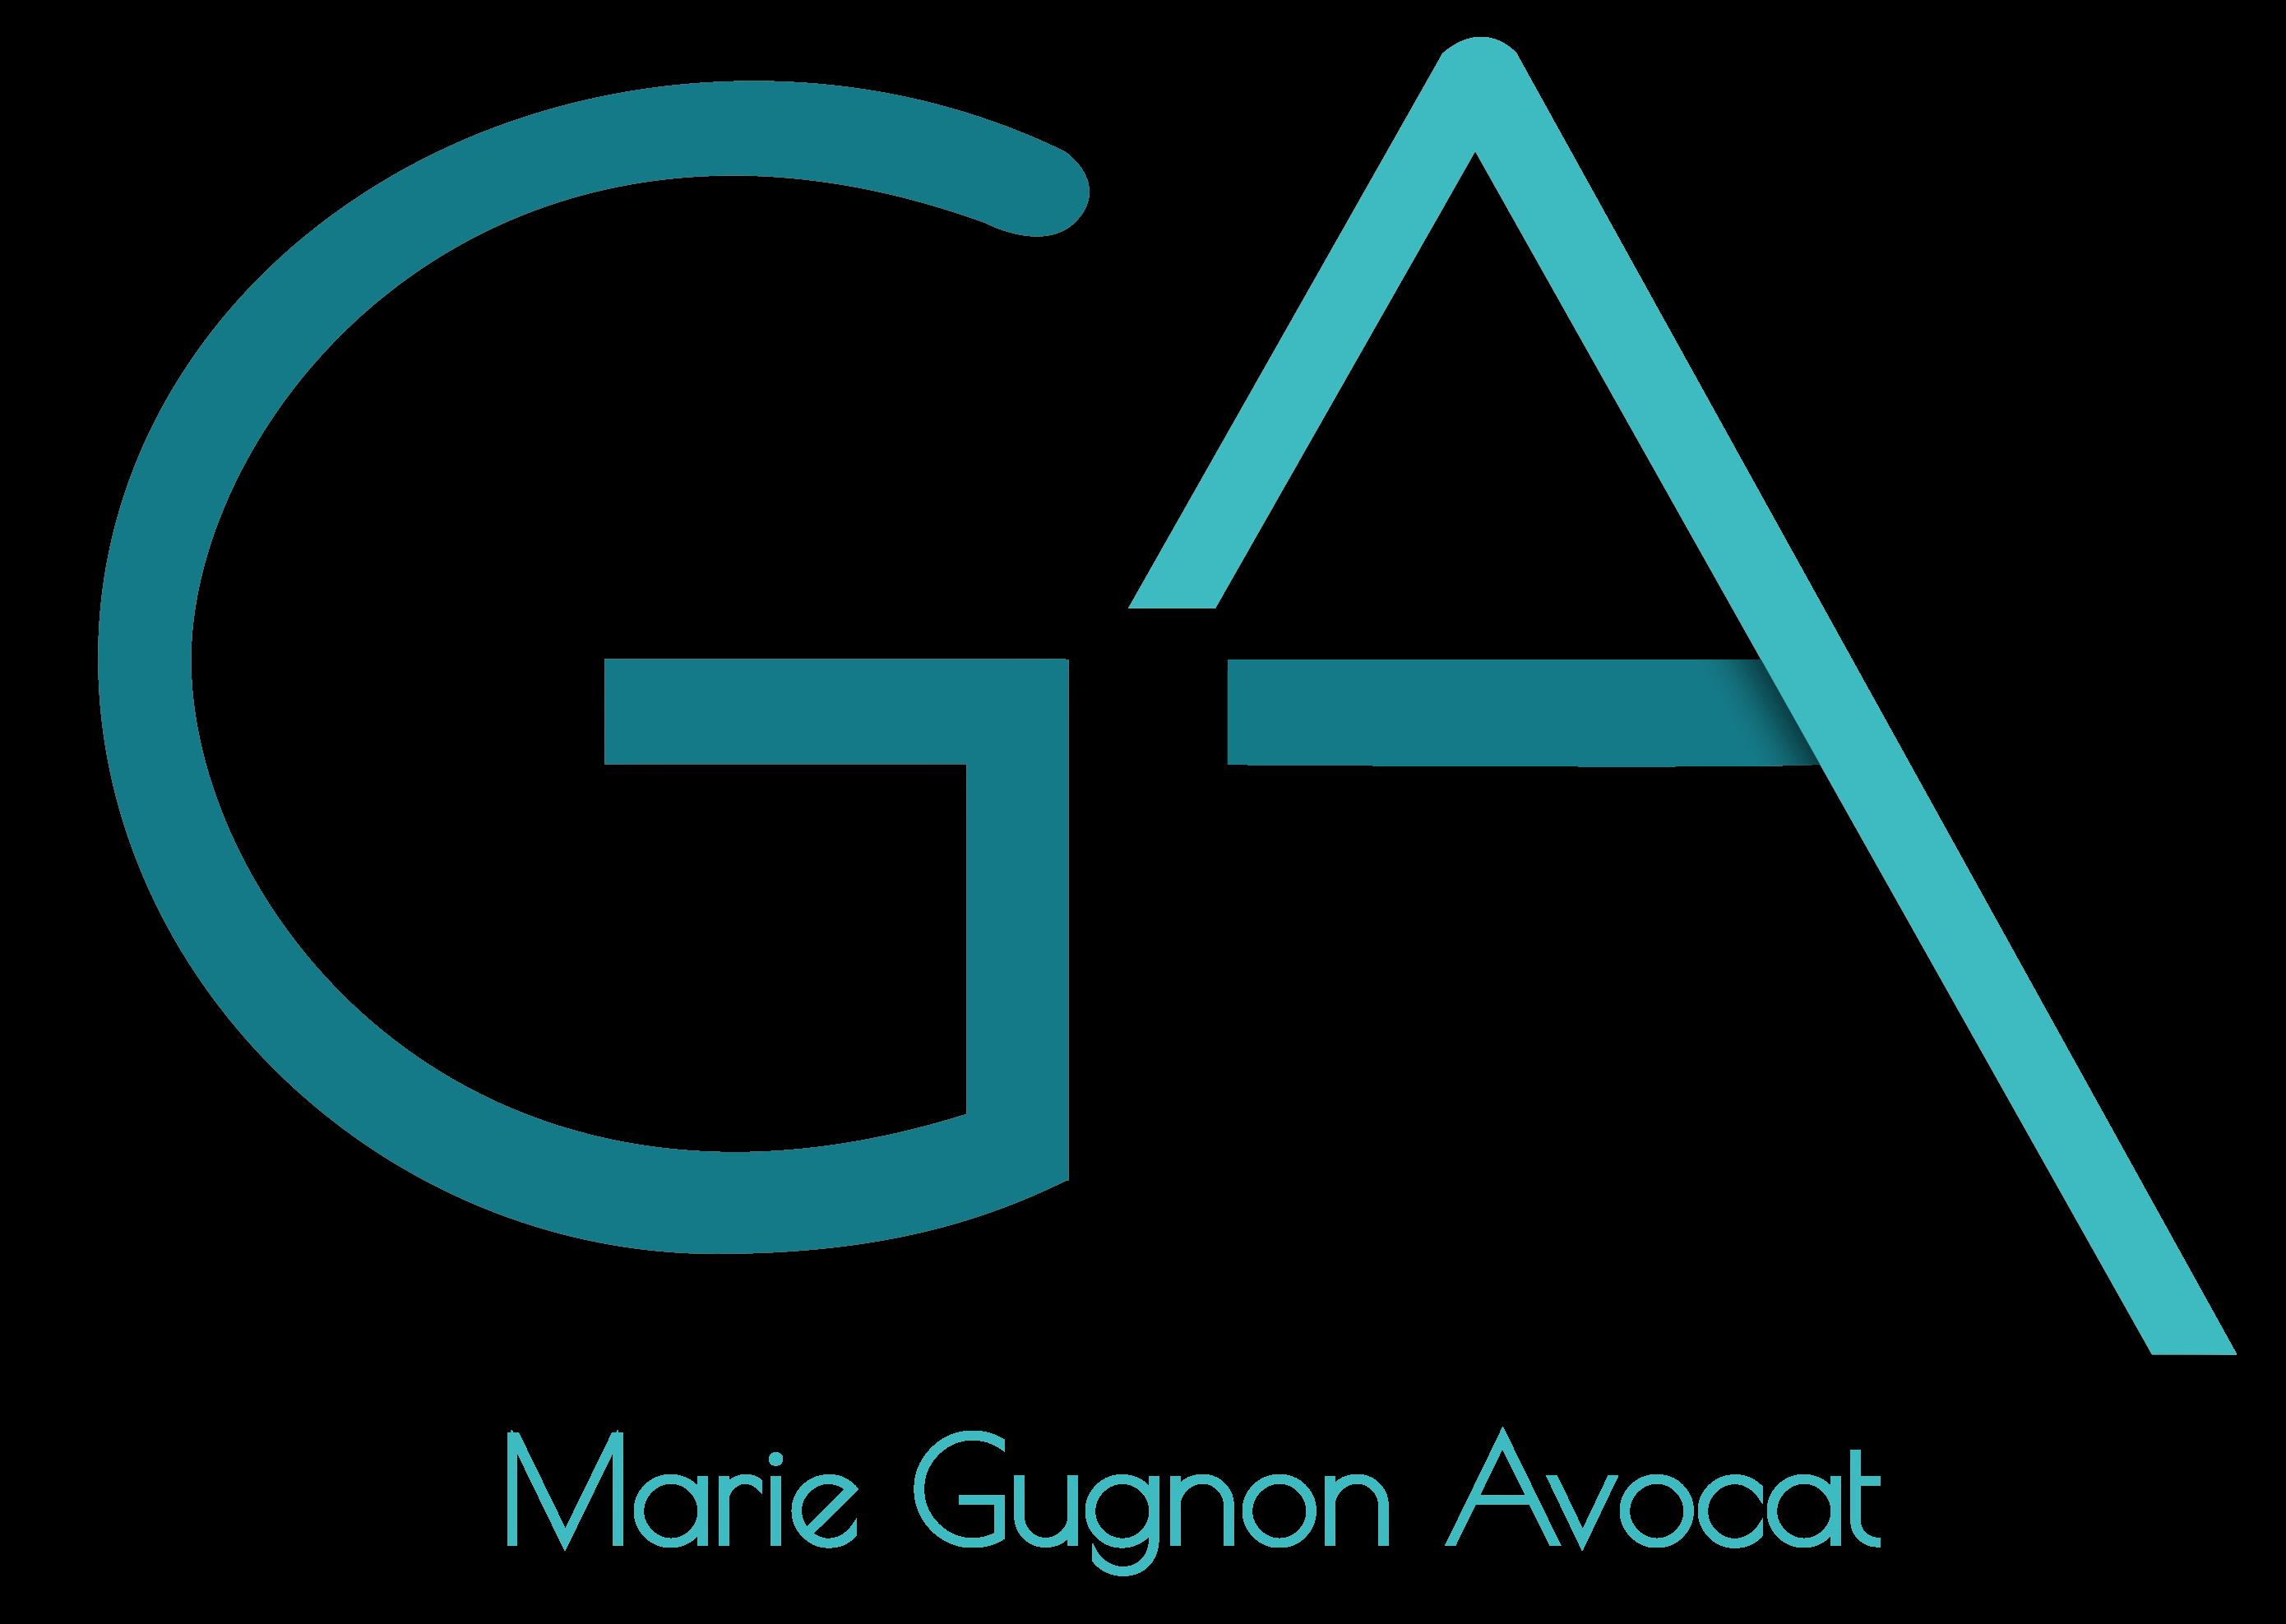 Marie Gugnon Avocat